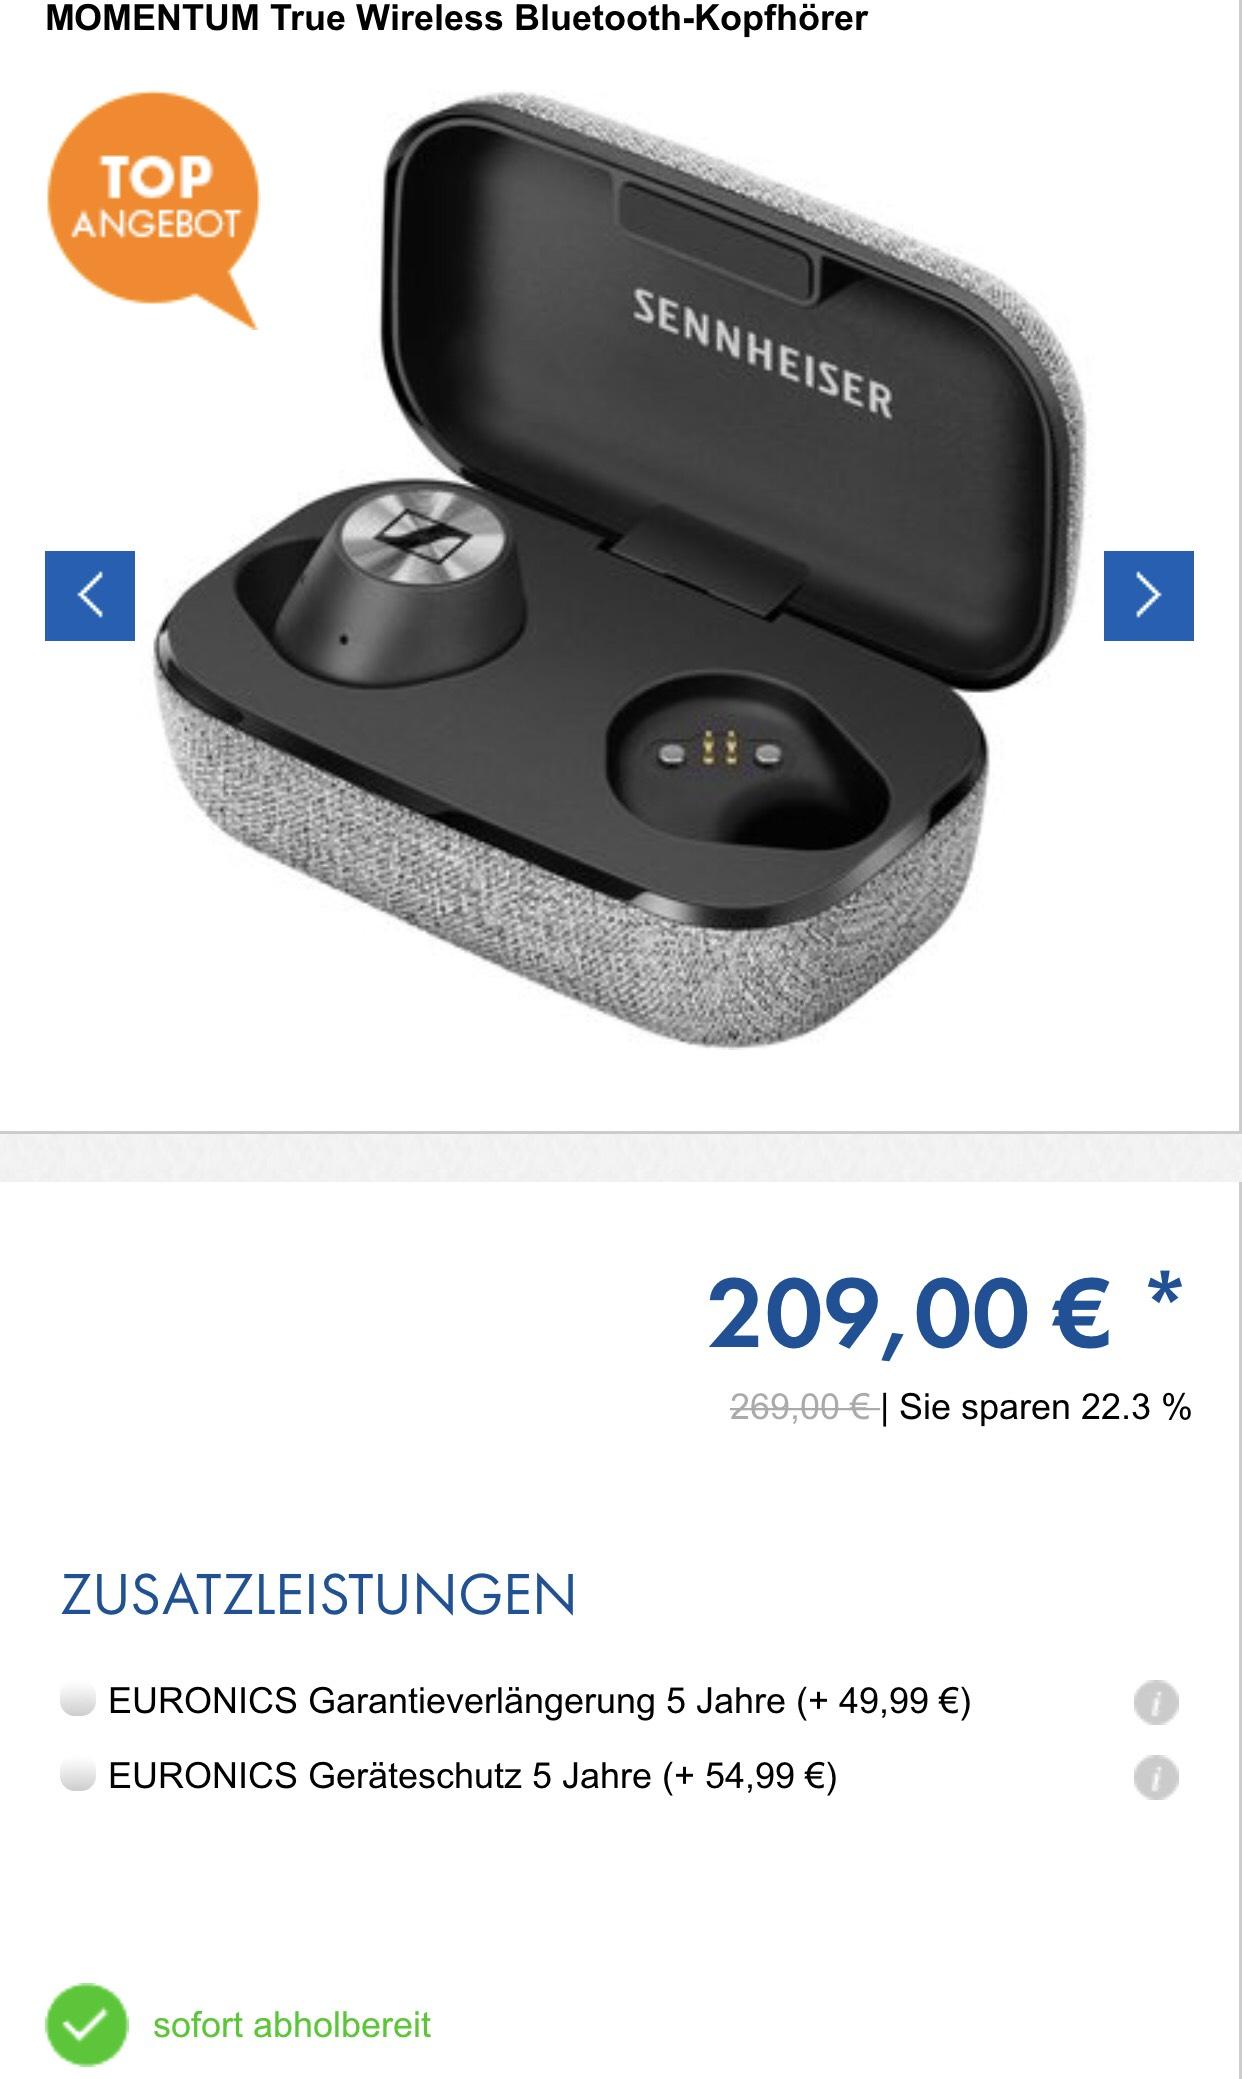 Sennheiser MOMENTUM True Wireless Bluetooth-Kopfhörer